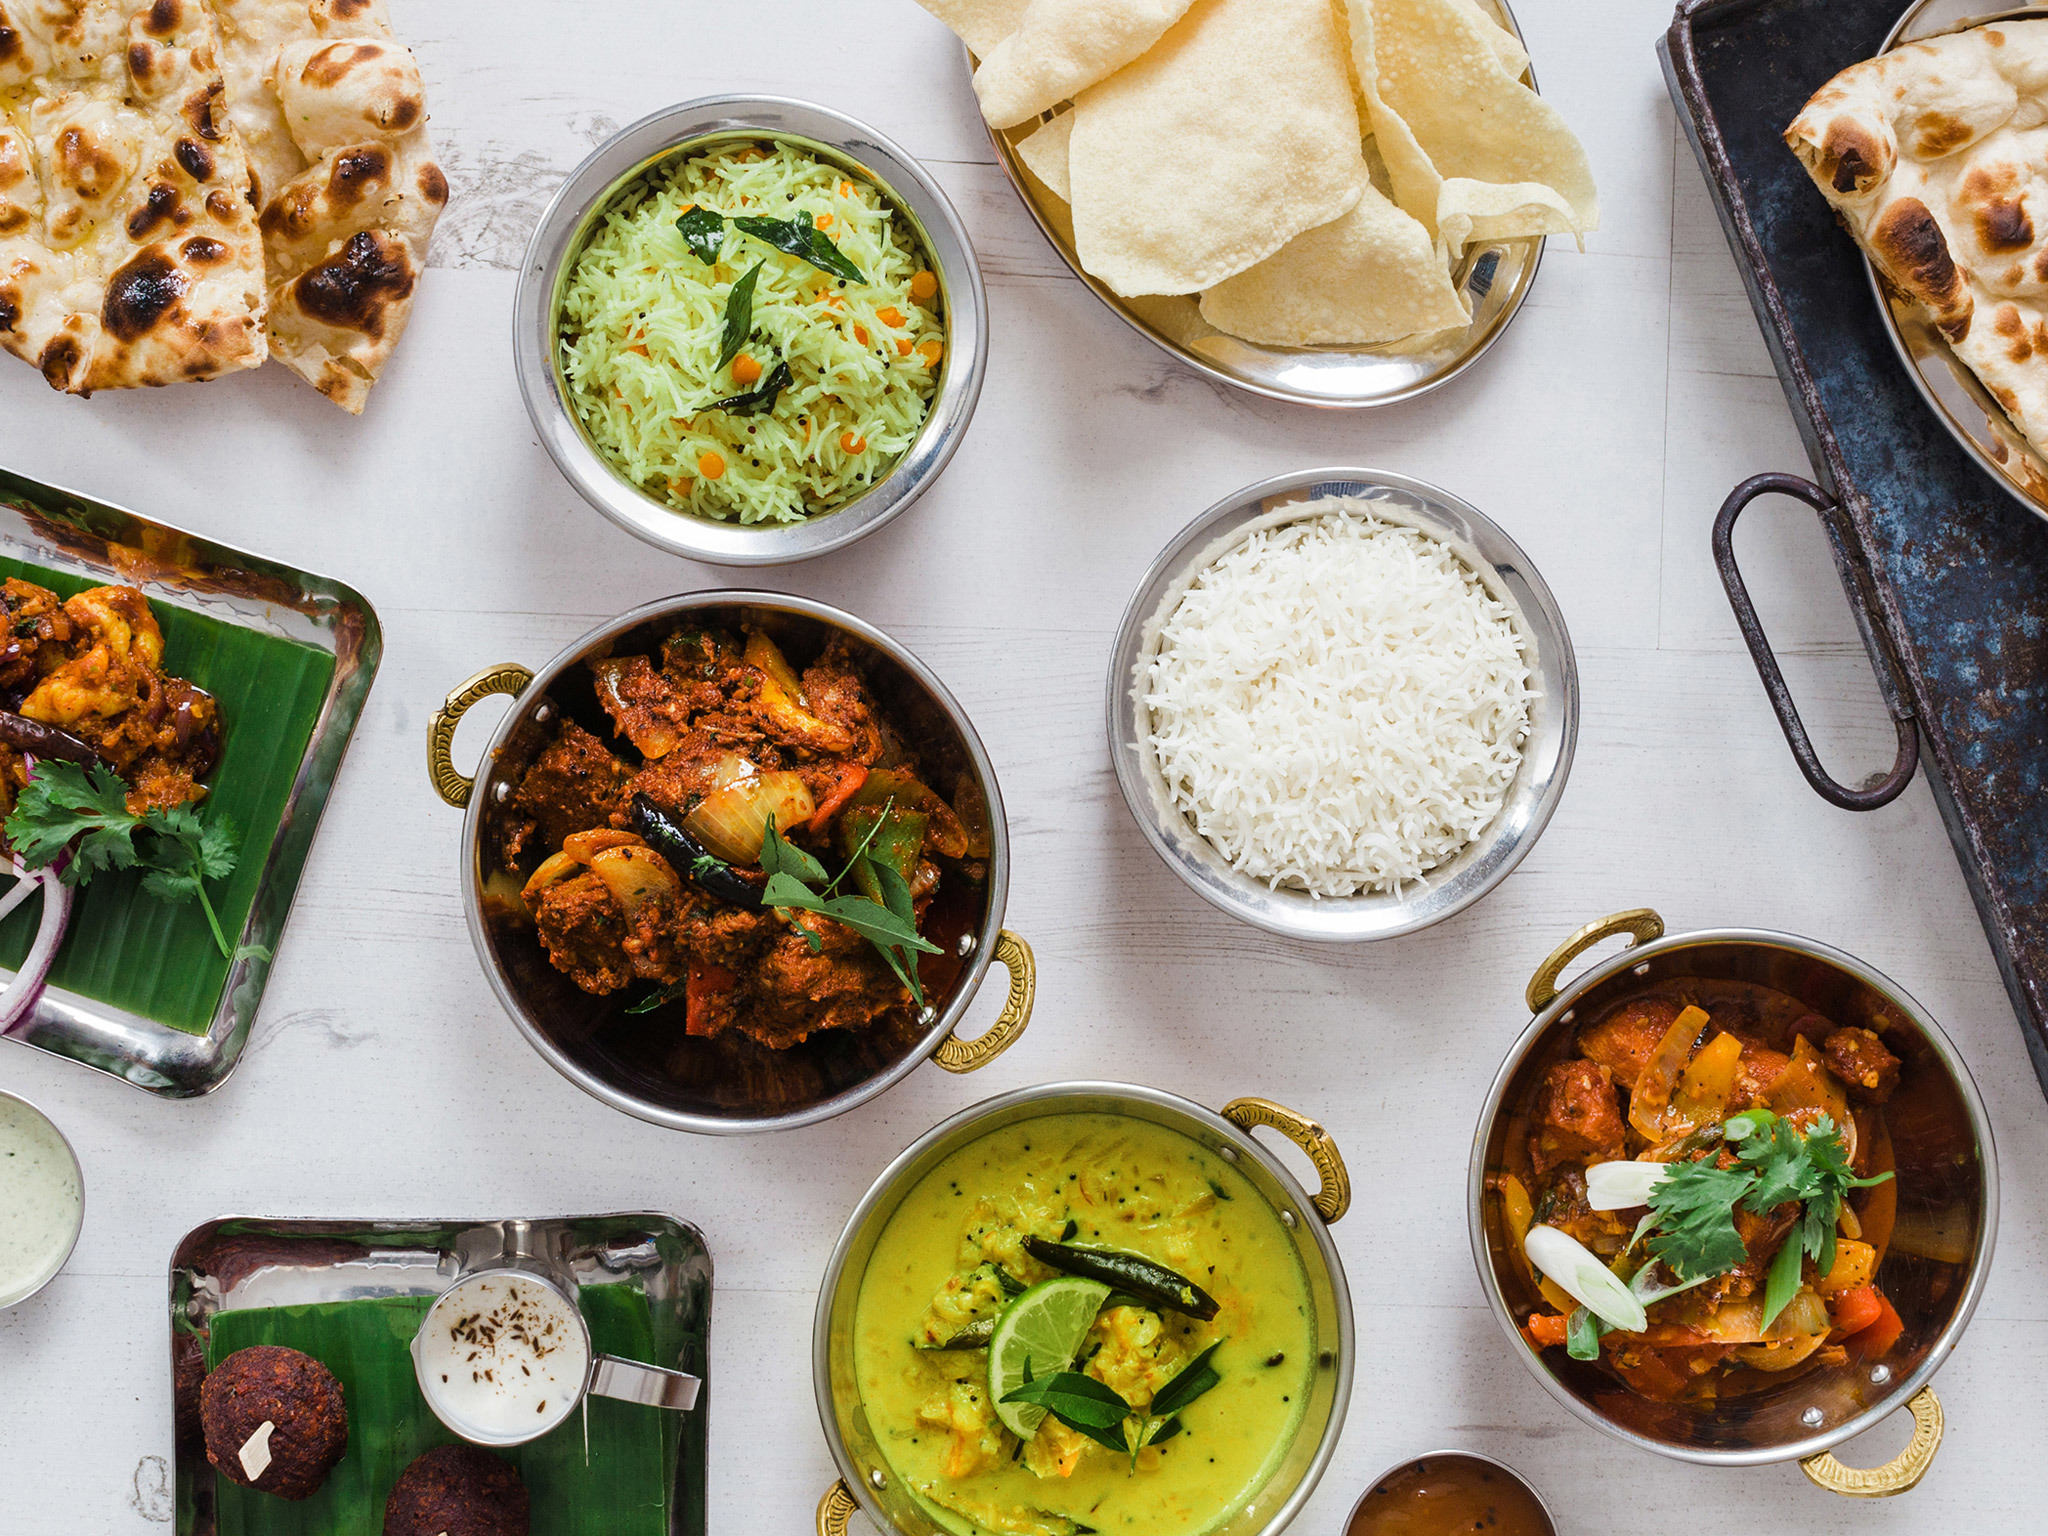 The 11 best Indian restaurants in Dublin